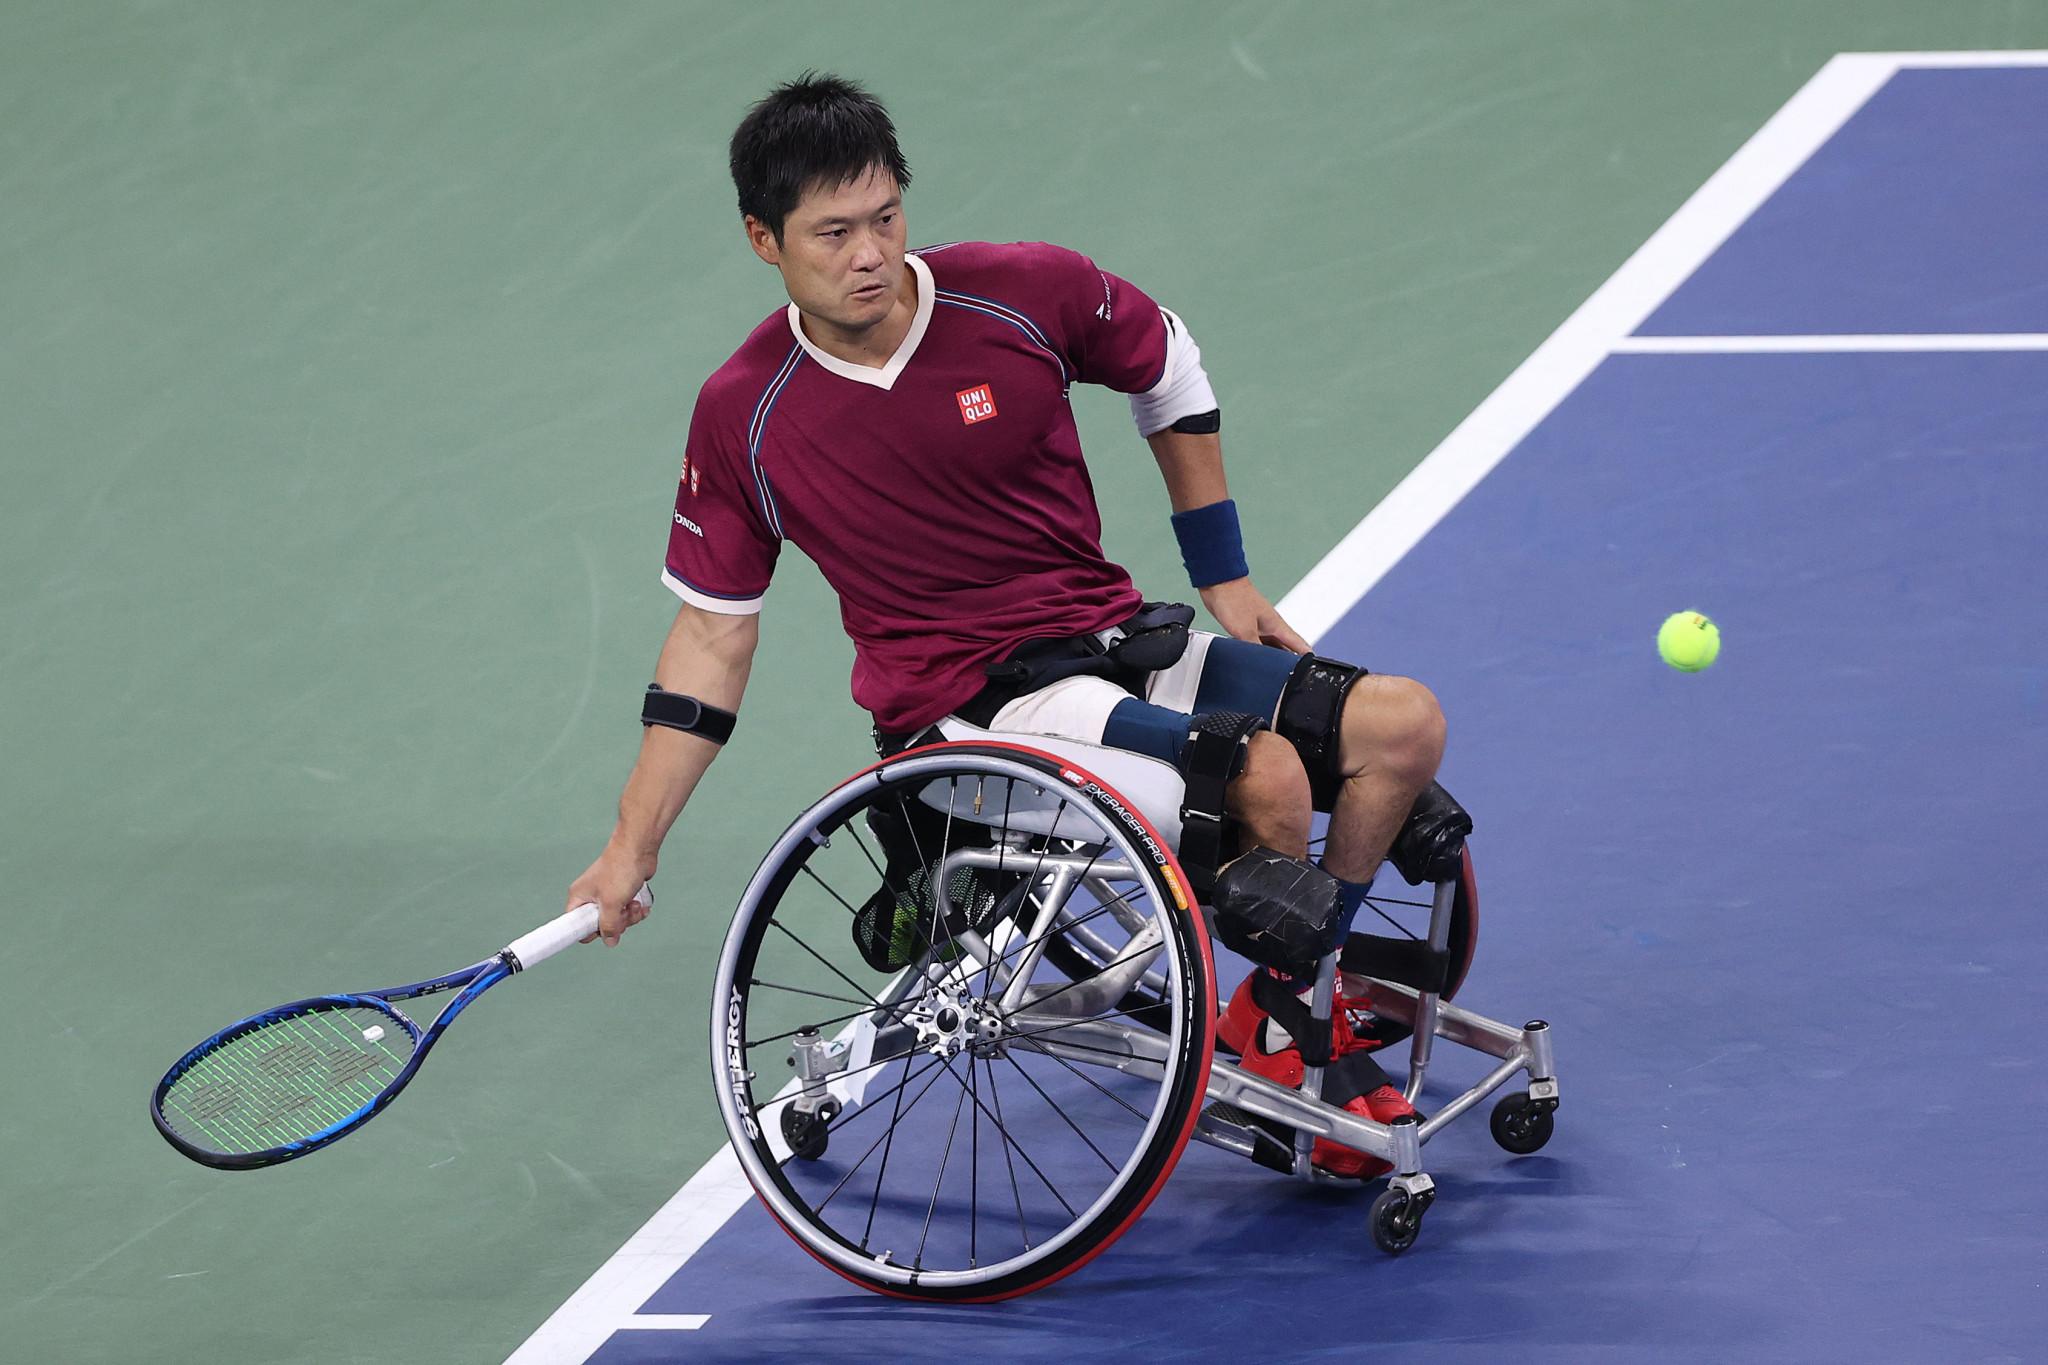 Tokyo 2020 gold medallist Kunieda begins US Open title defence in style